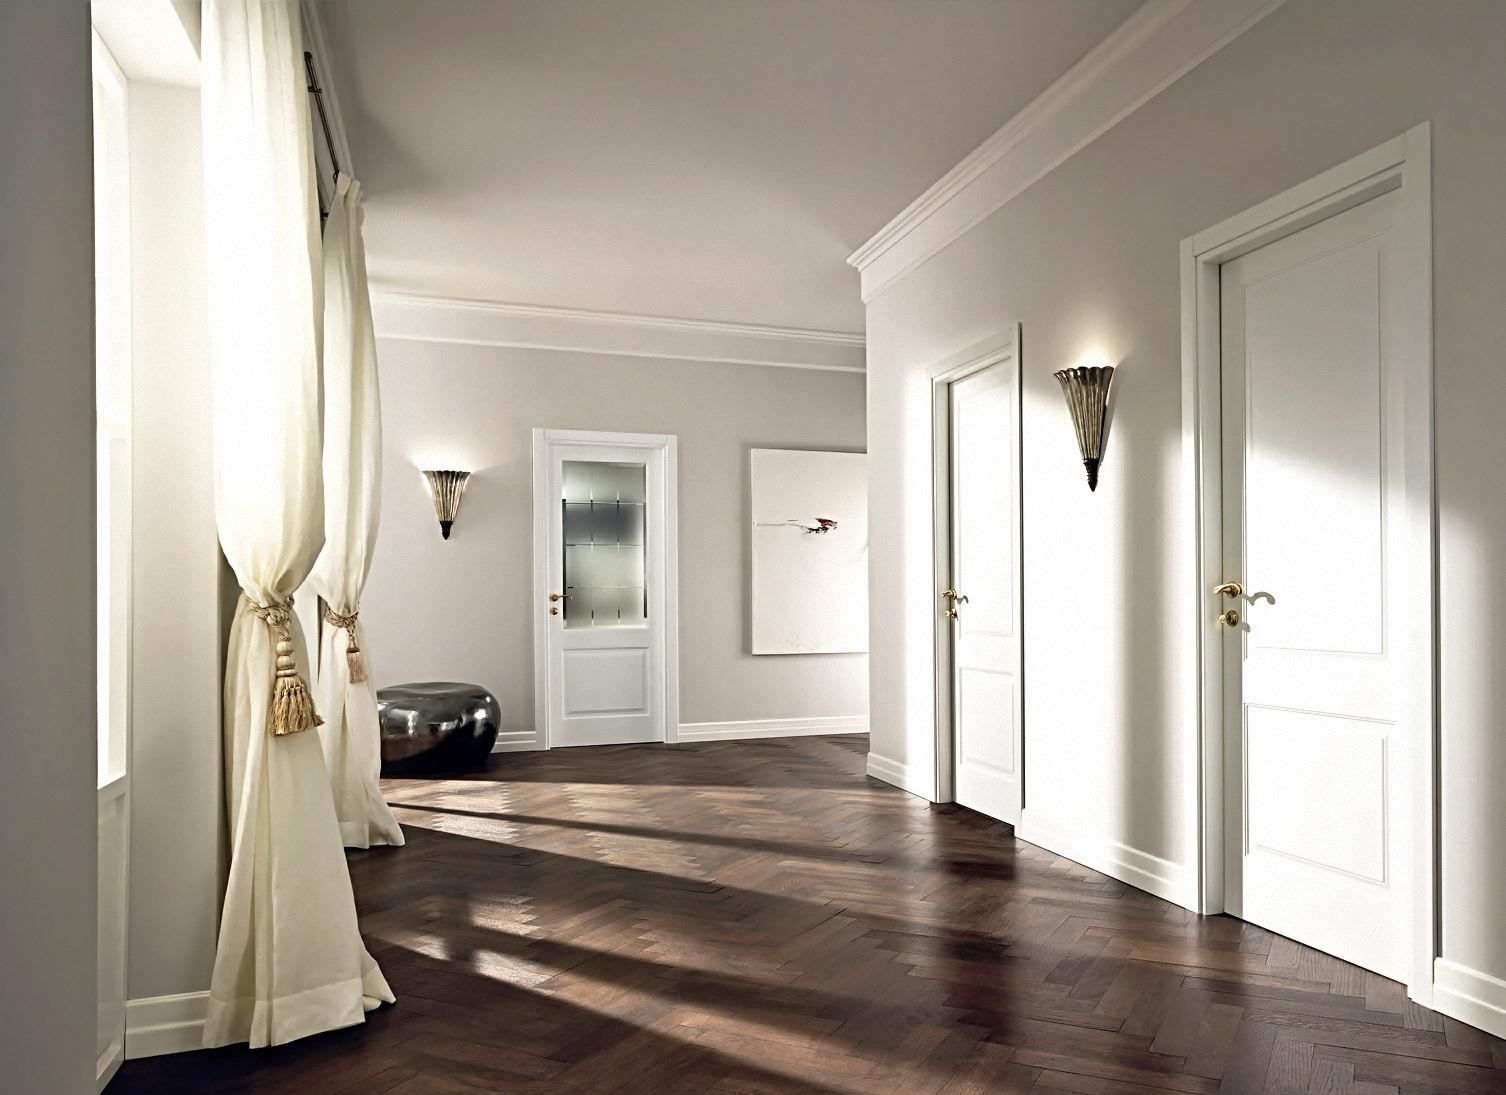 Интерьер светлые двери.темные стены